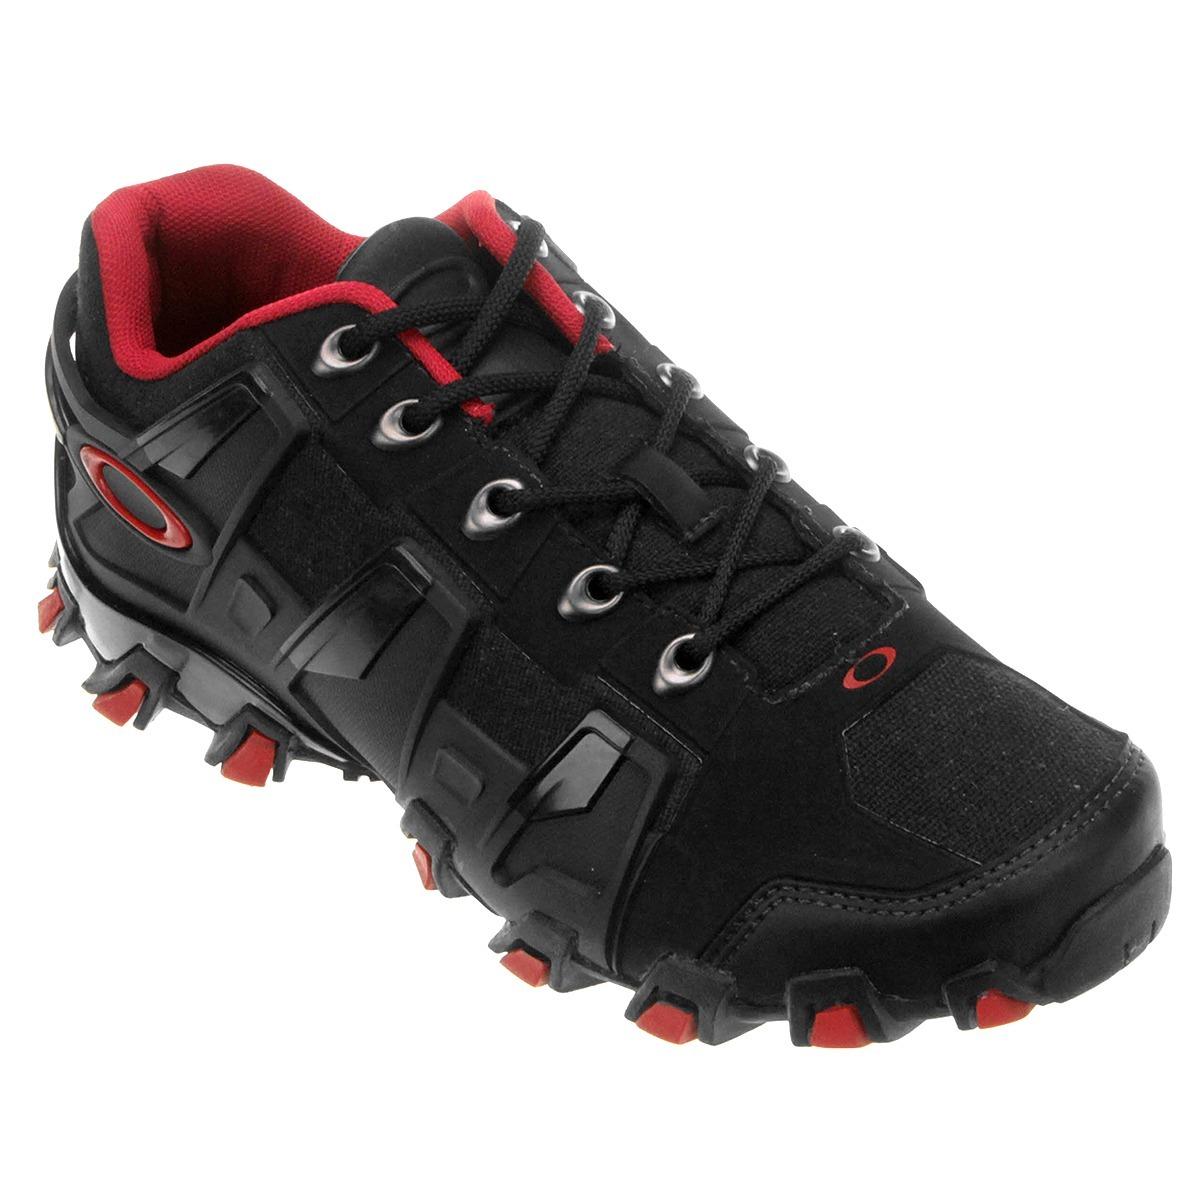 10b459dc5 tênis bota oakley hardshell masculino feminino ta barato d+. Carregando  zoom.